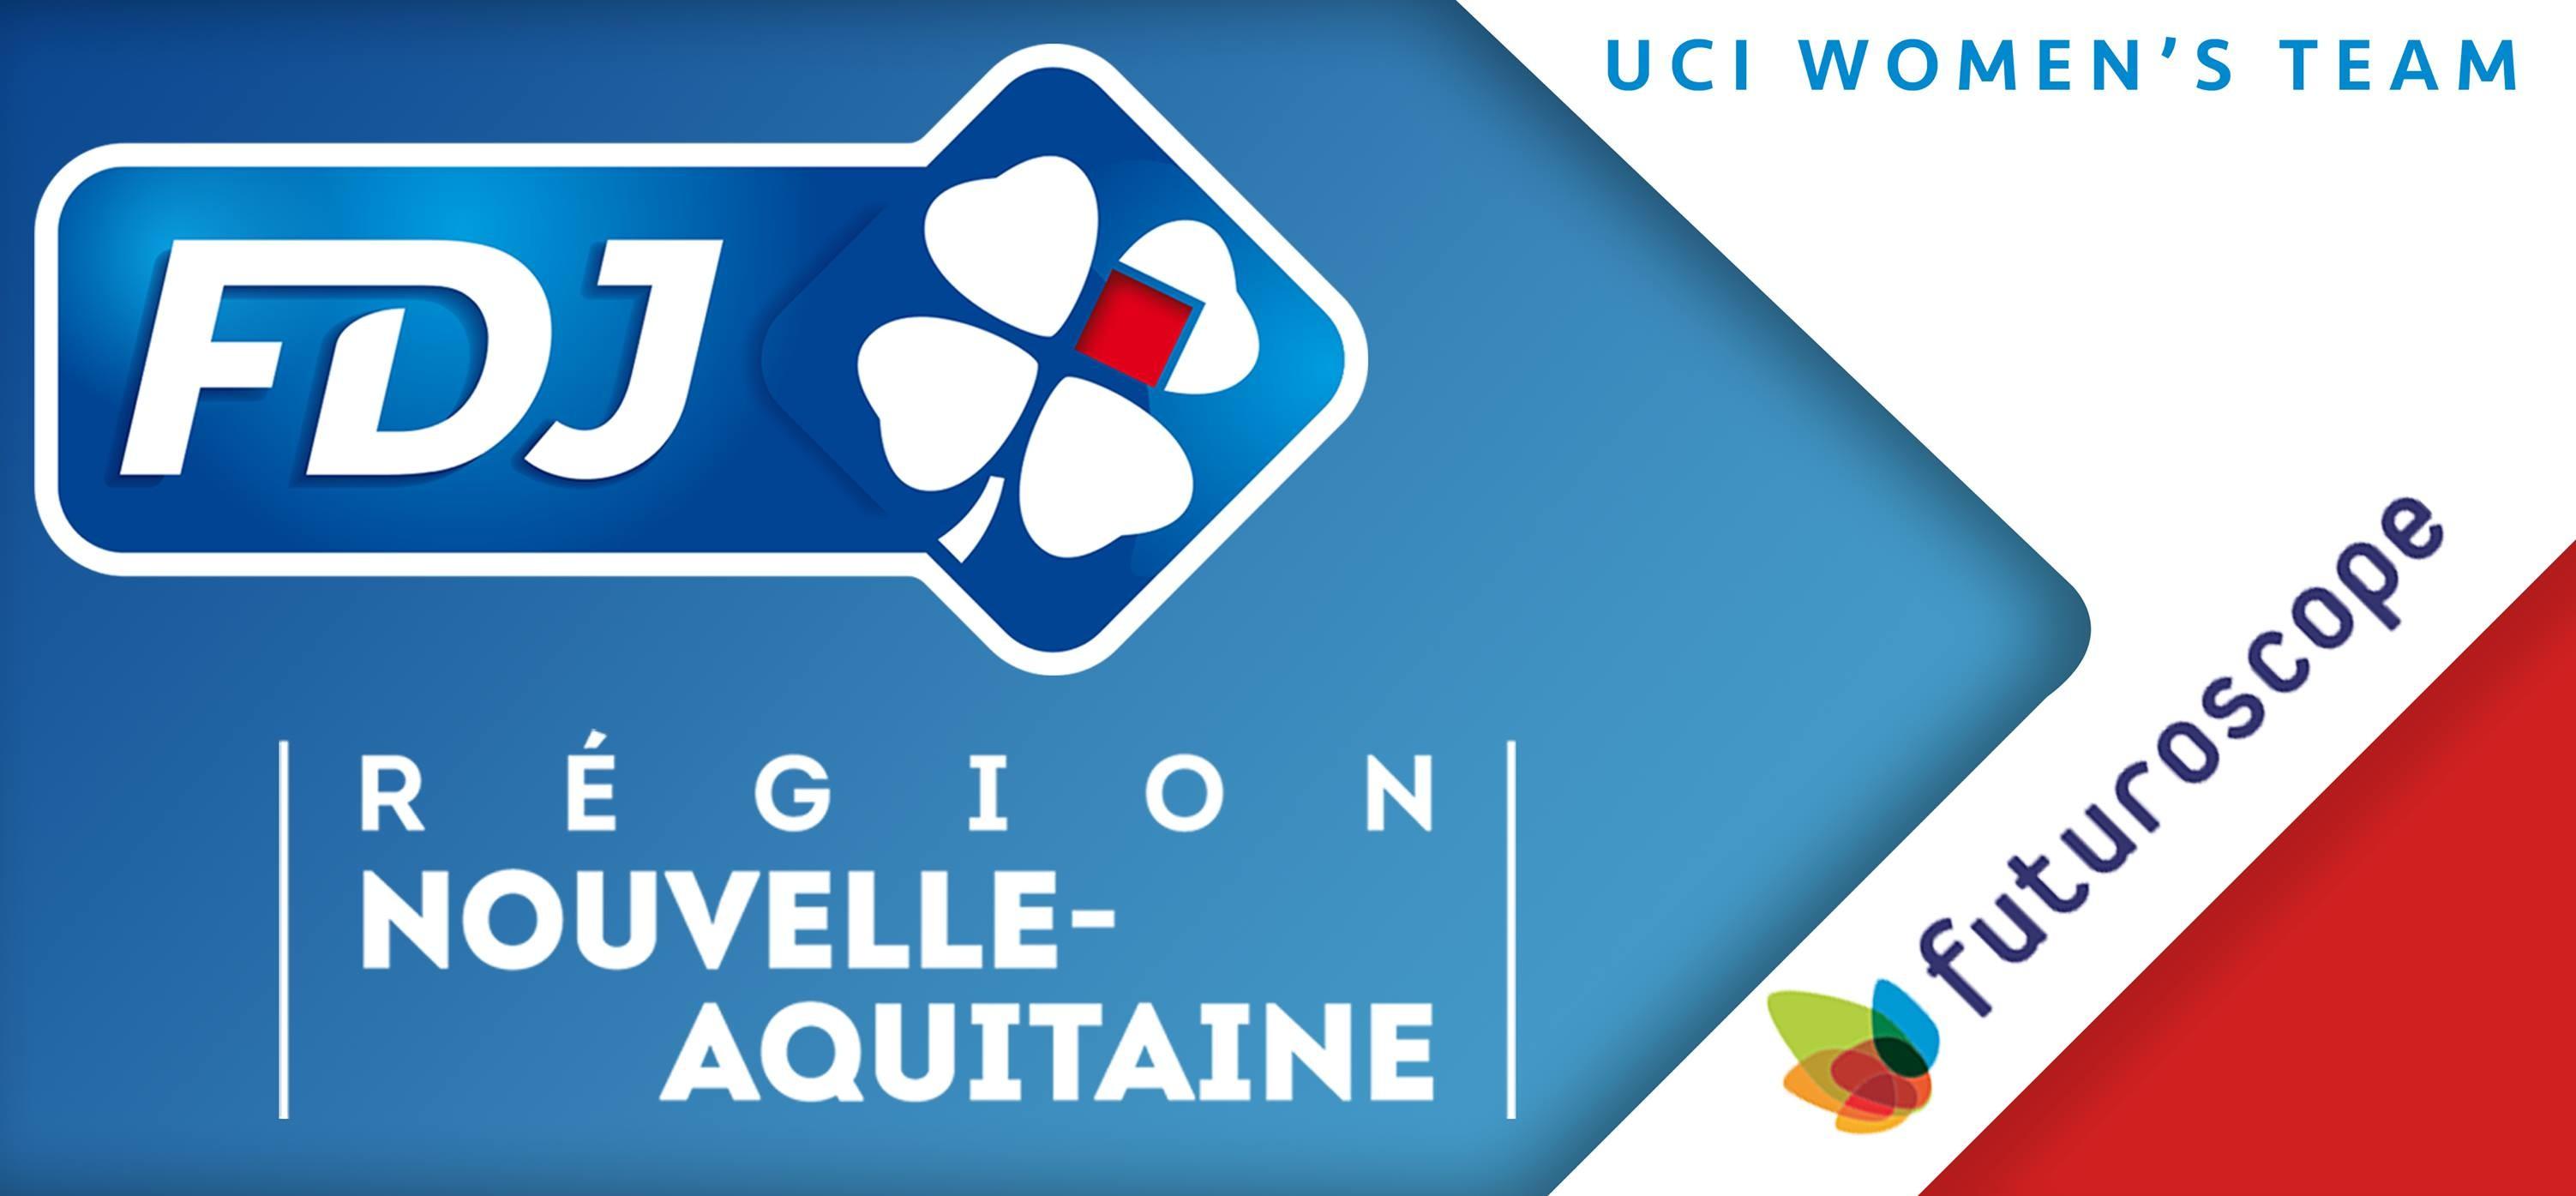 nwm-equipe-pro-uci-women-fdj-nouvelle-aquitaine-futuroscope